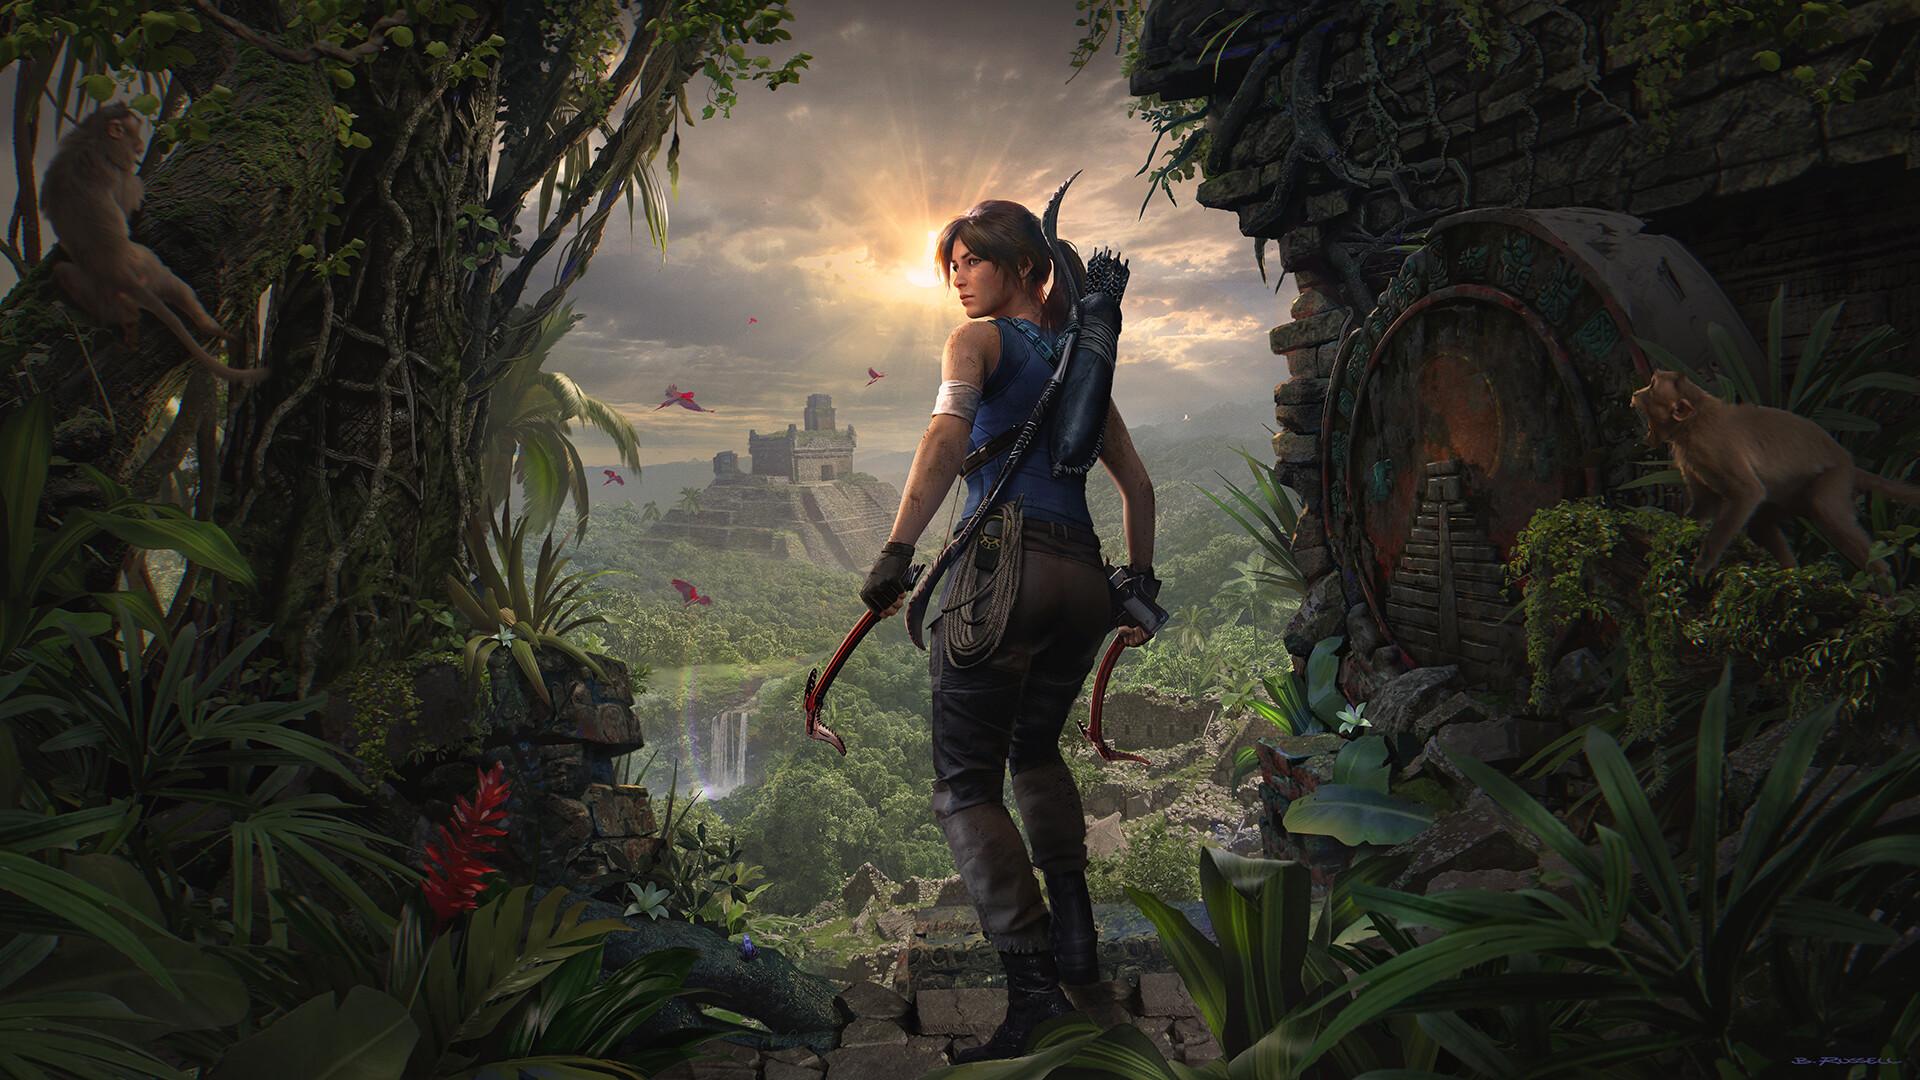 купить Shadow of the Tomb Raider на gamingportals